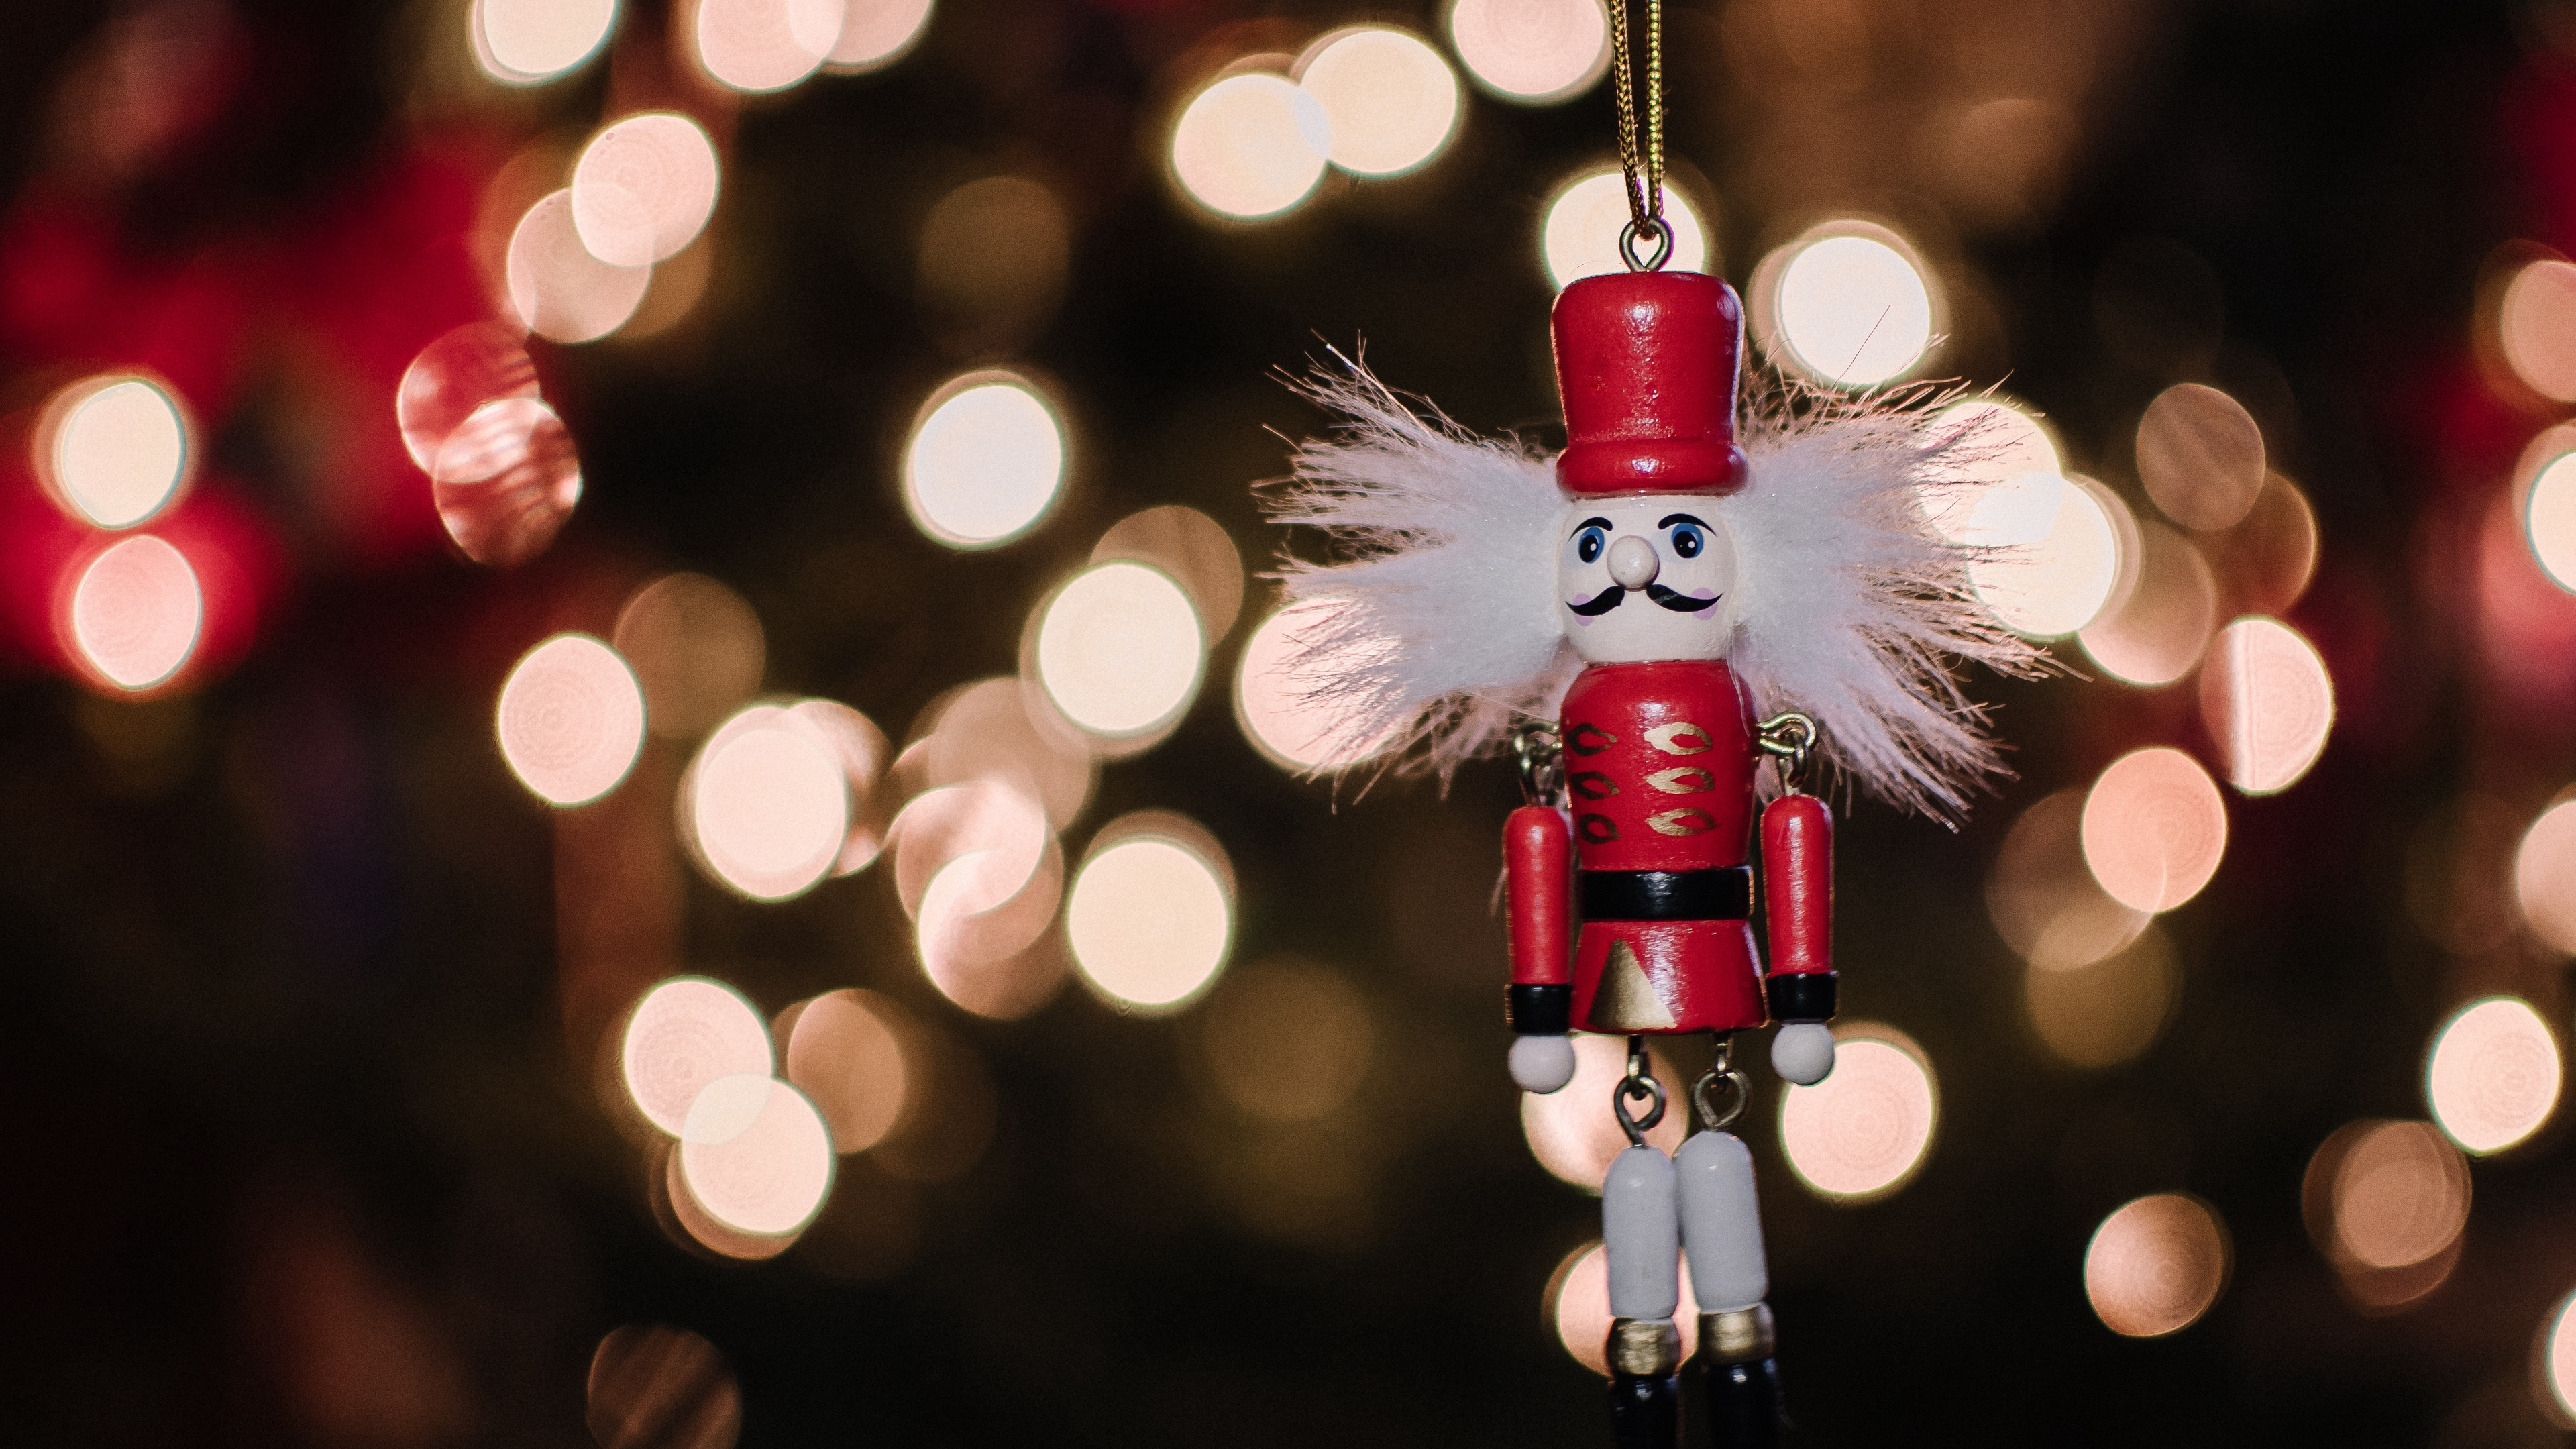 nutcracker new year christmas 4k 1538345133 - nutcracker, new year, christmas 4k - nutcracker, new year, Christmas